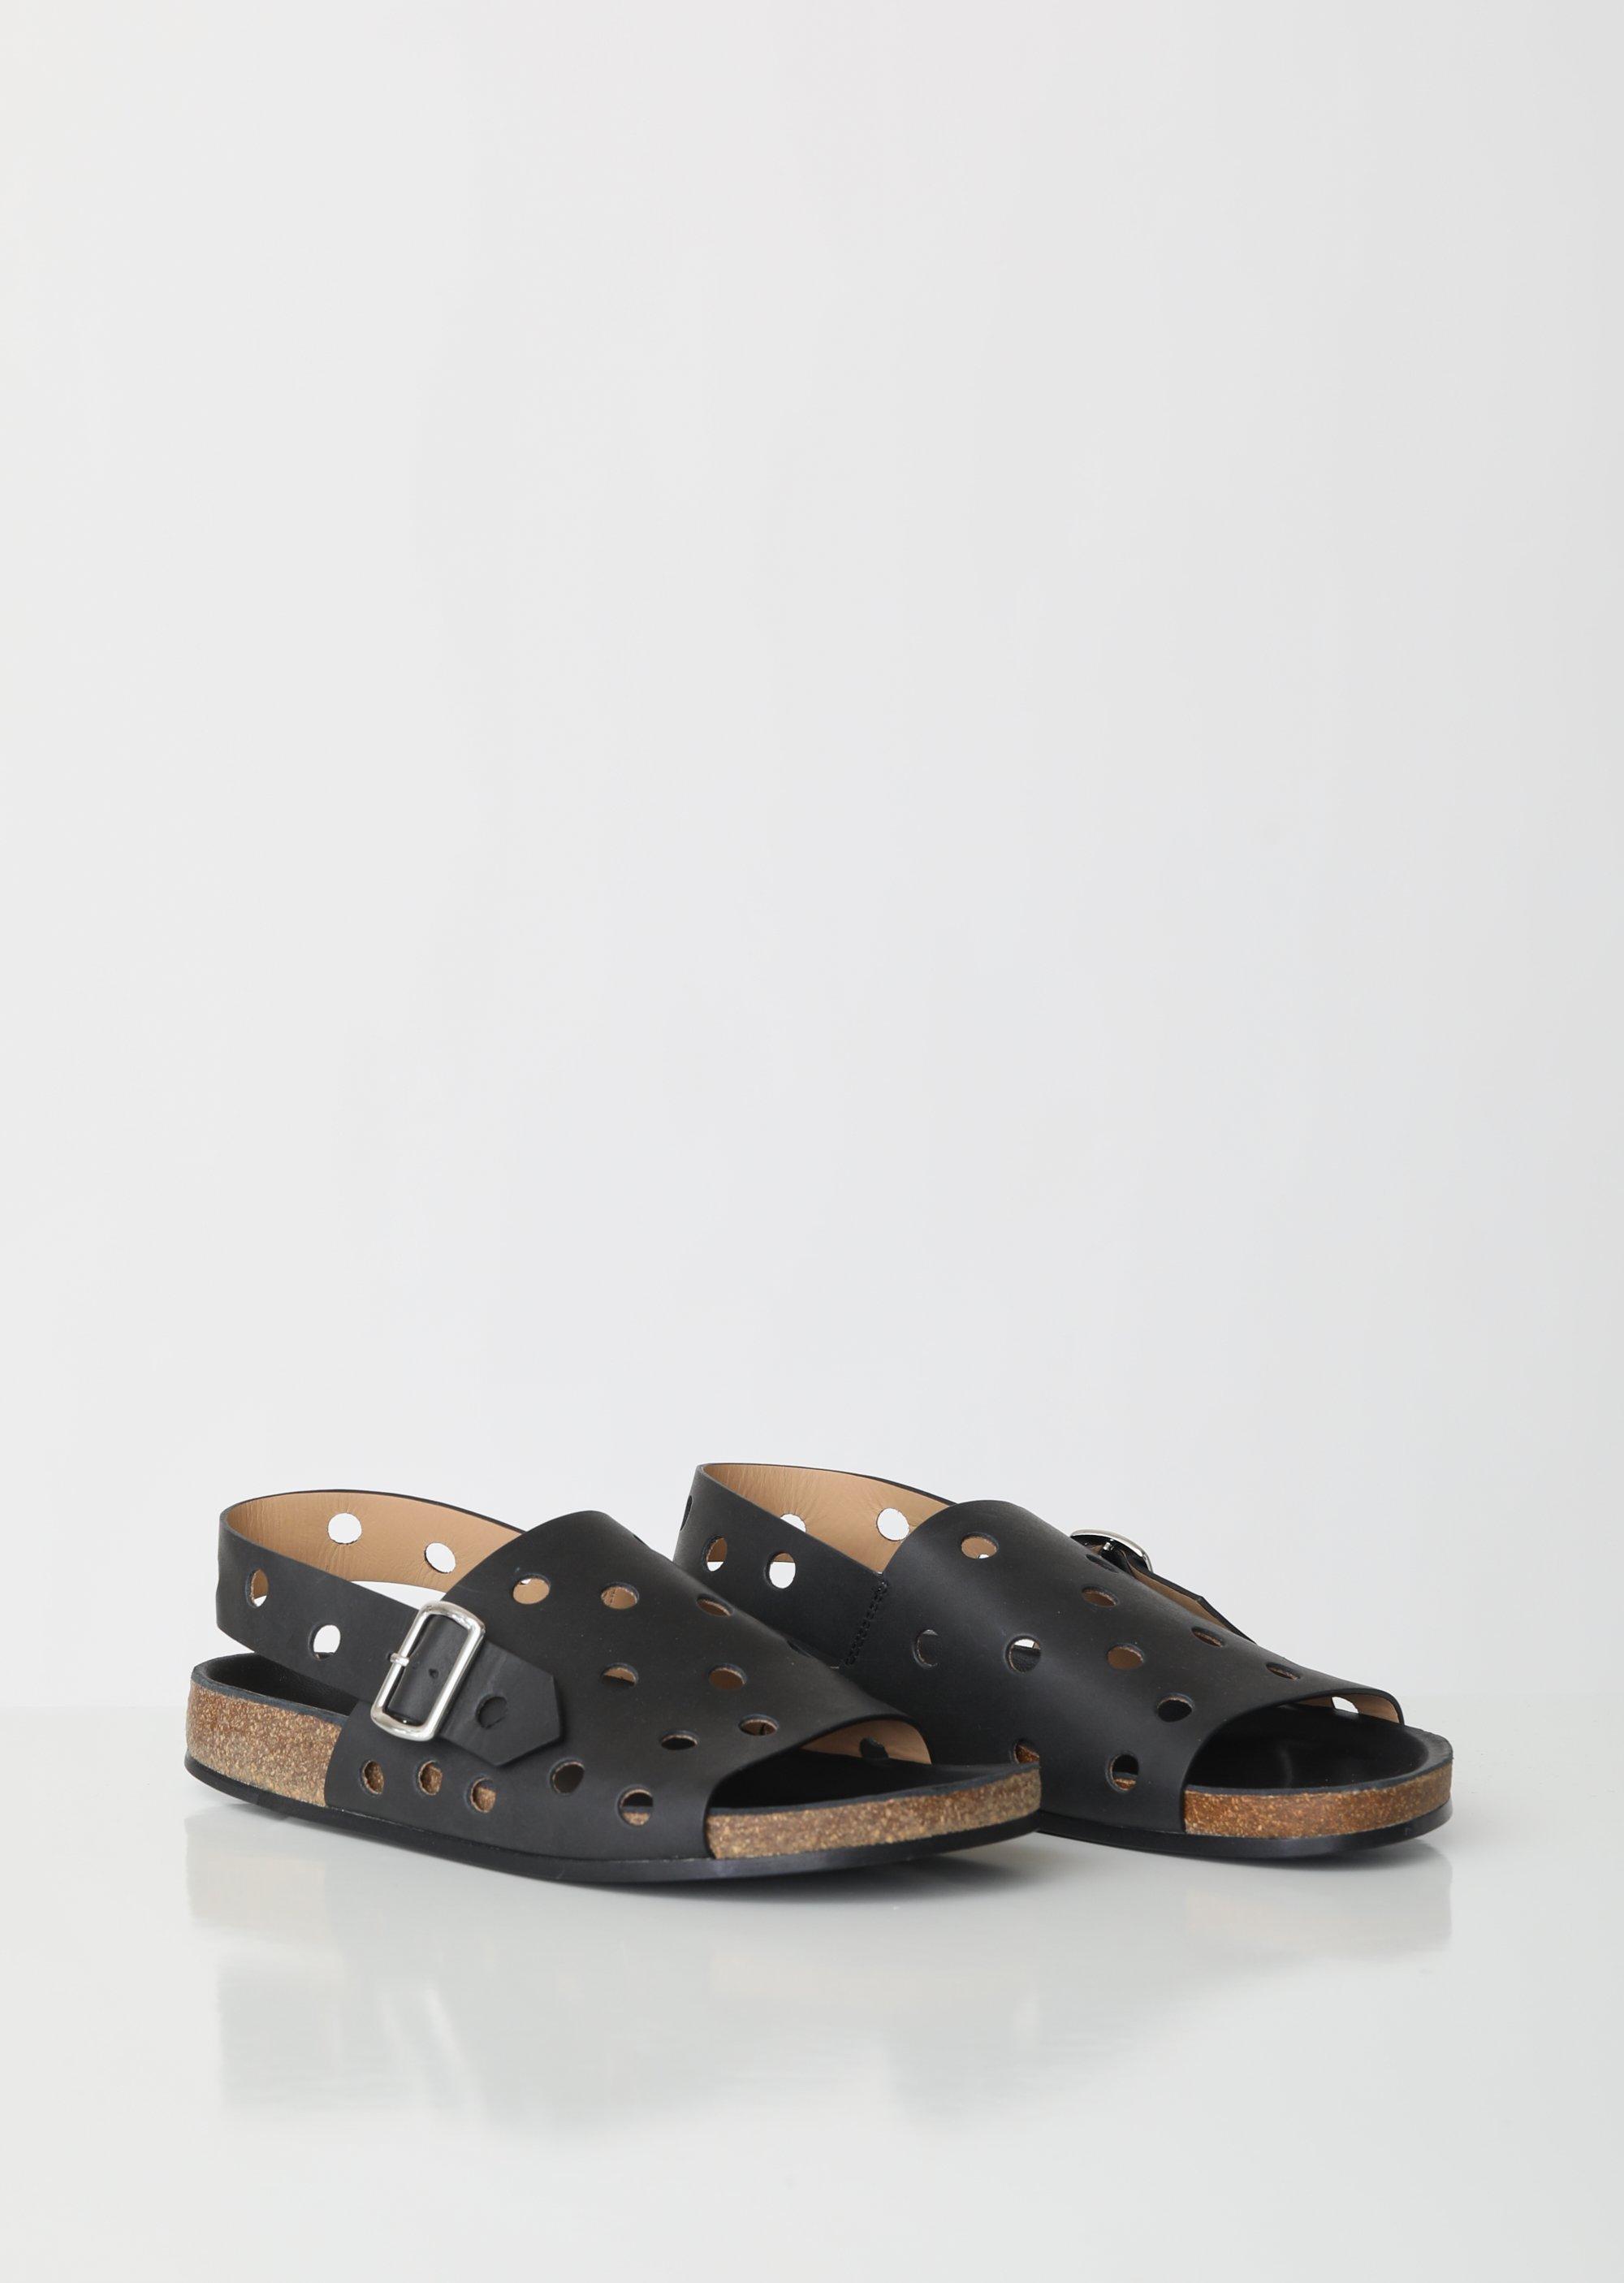 fa680c73499a Jil Sander Navy - Black Circle Cut Out Sandals - Lyst. View fullscreen